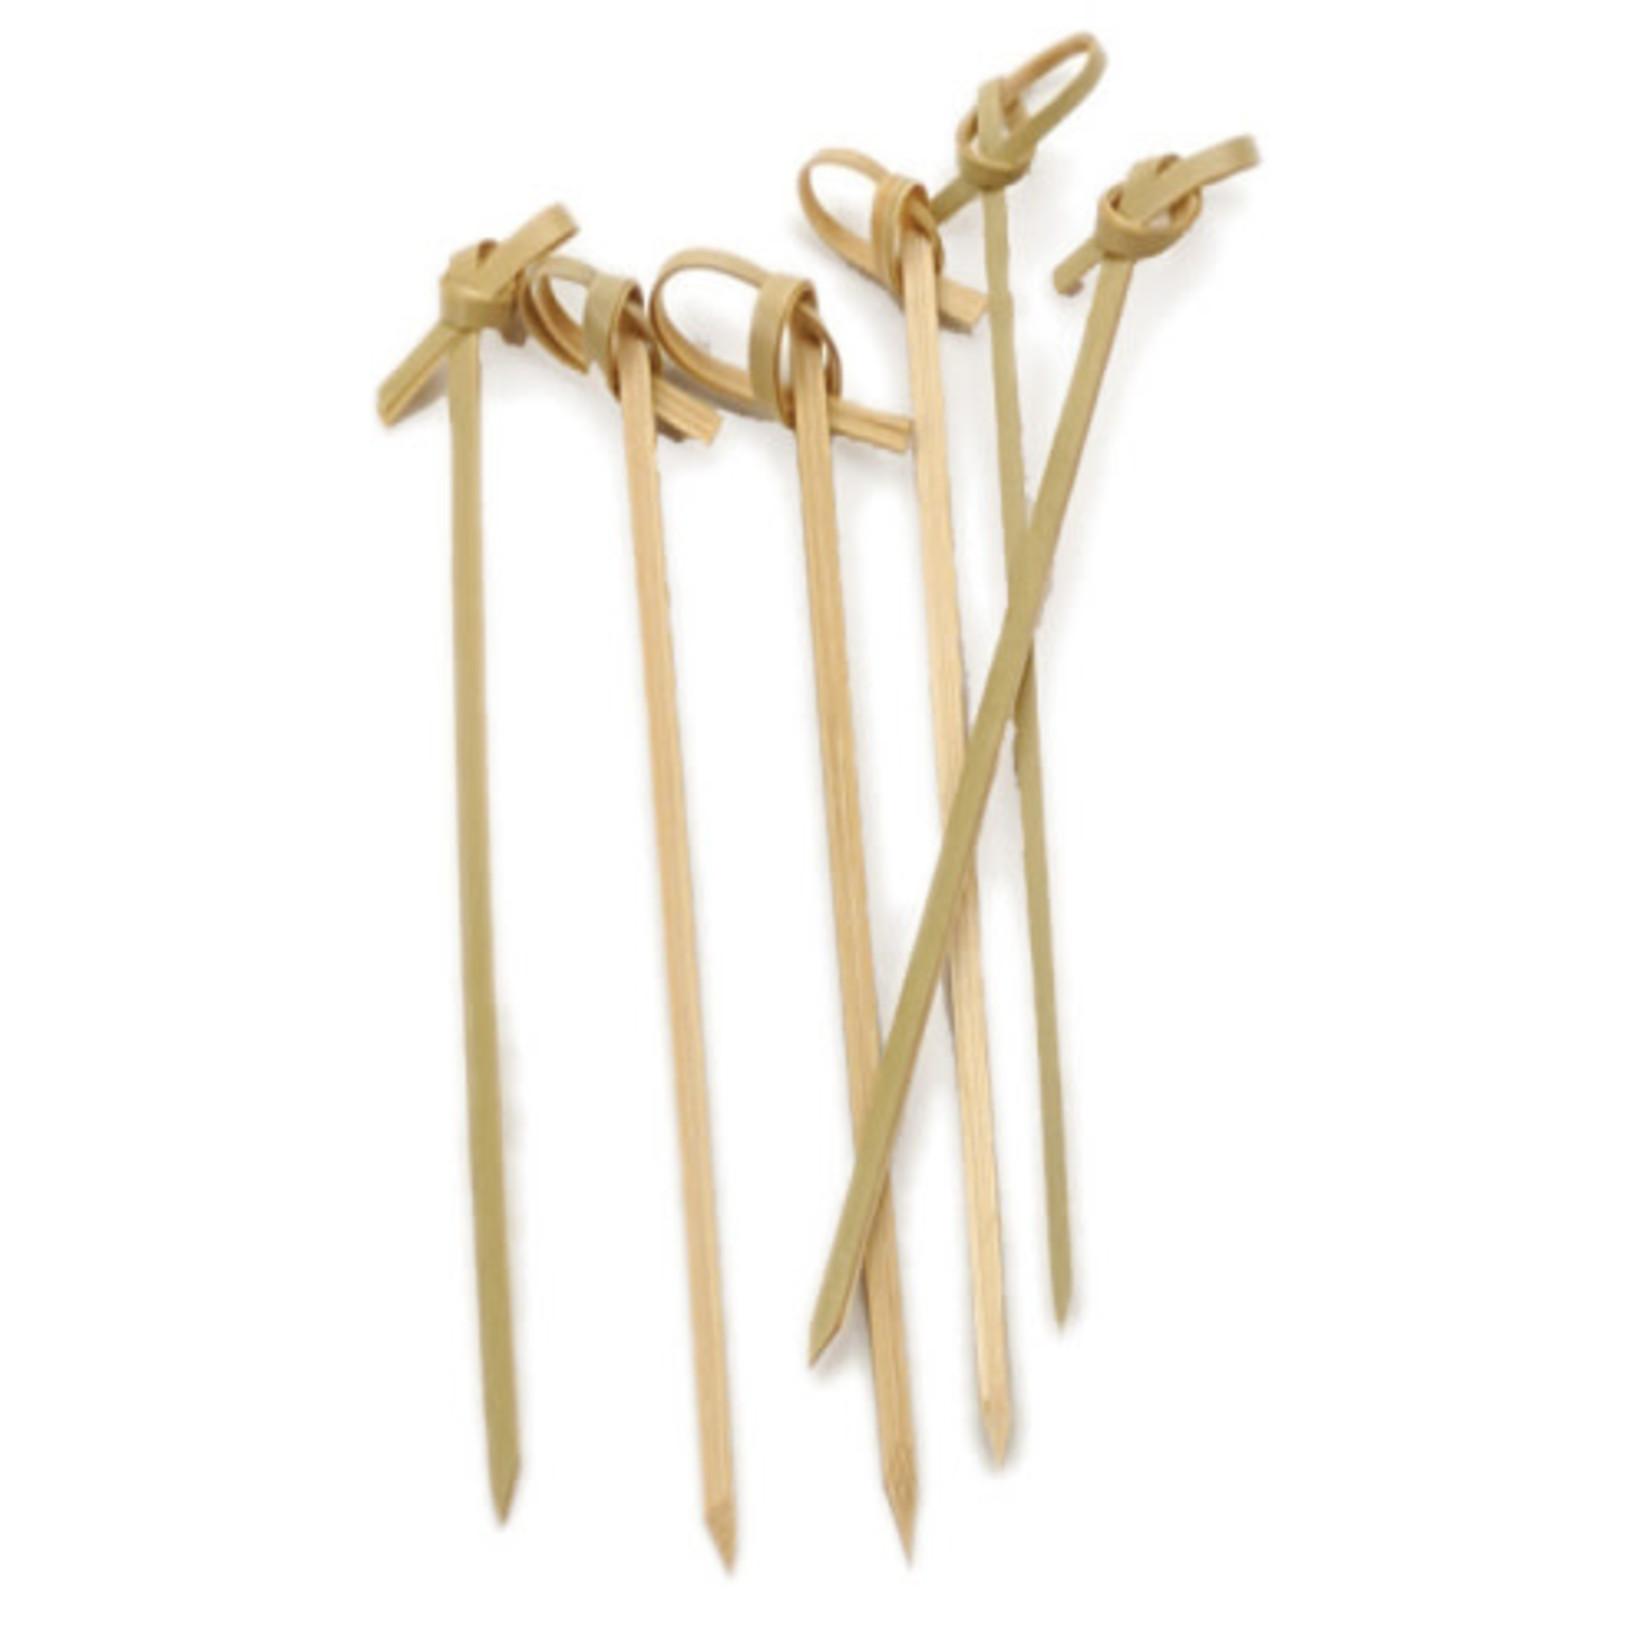 Danica Bamboo Knot Picks